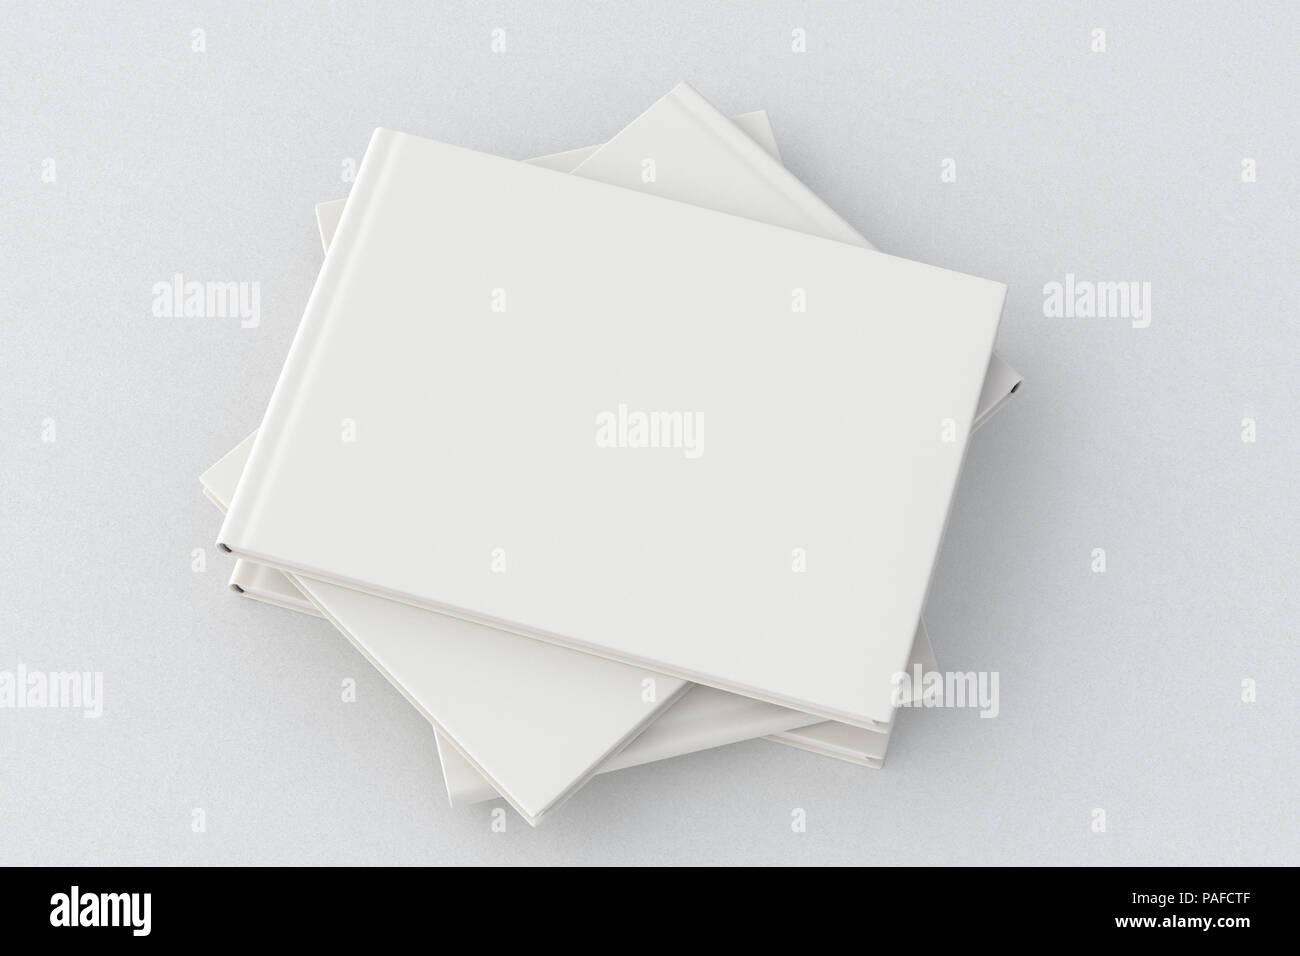 White horizontal blank cover book stack mockup on white